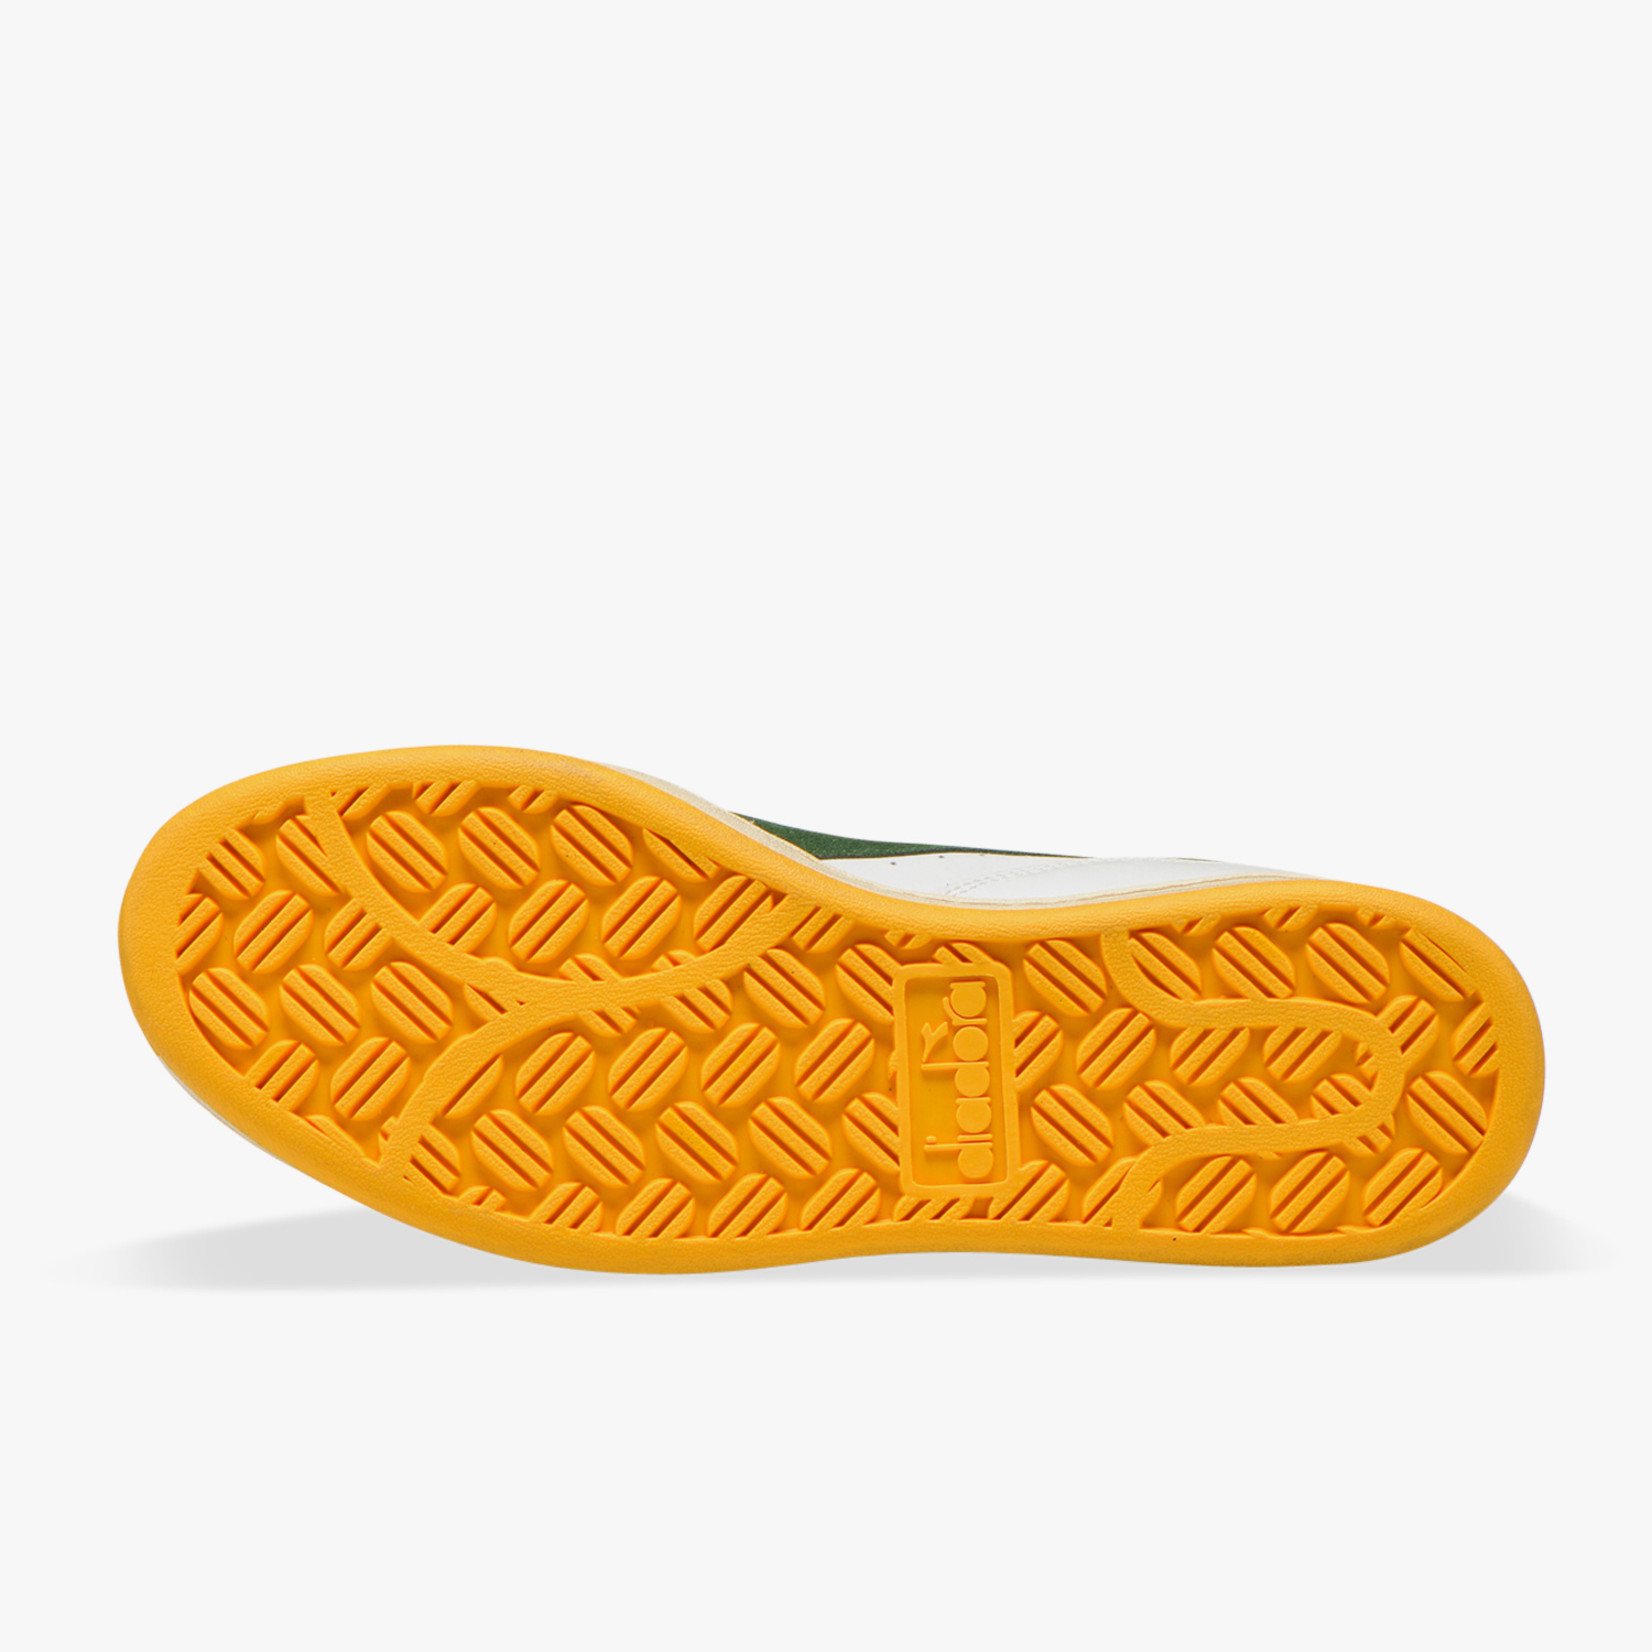 Diadora Mi Basket Low Icona Pastures/Gold